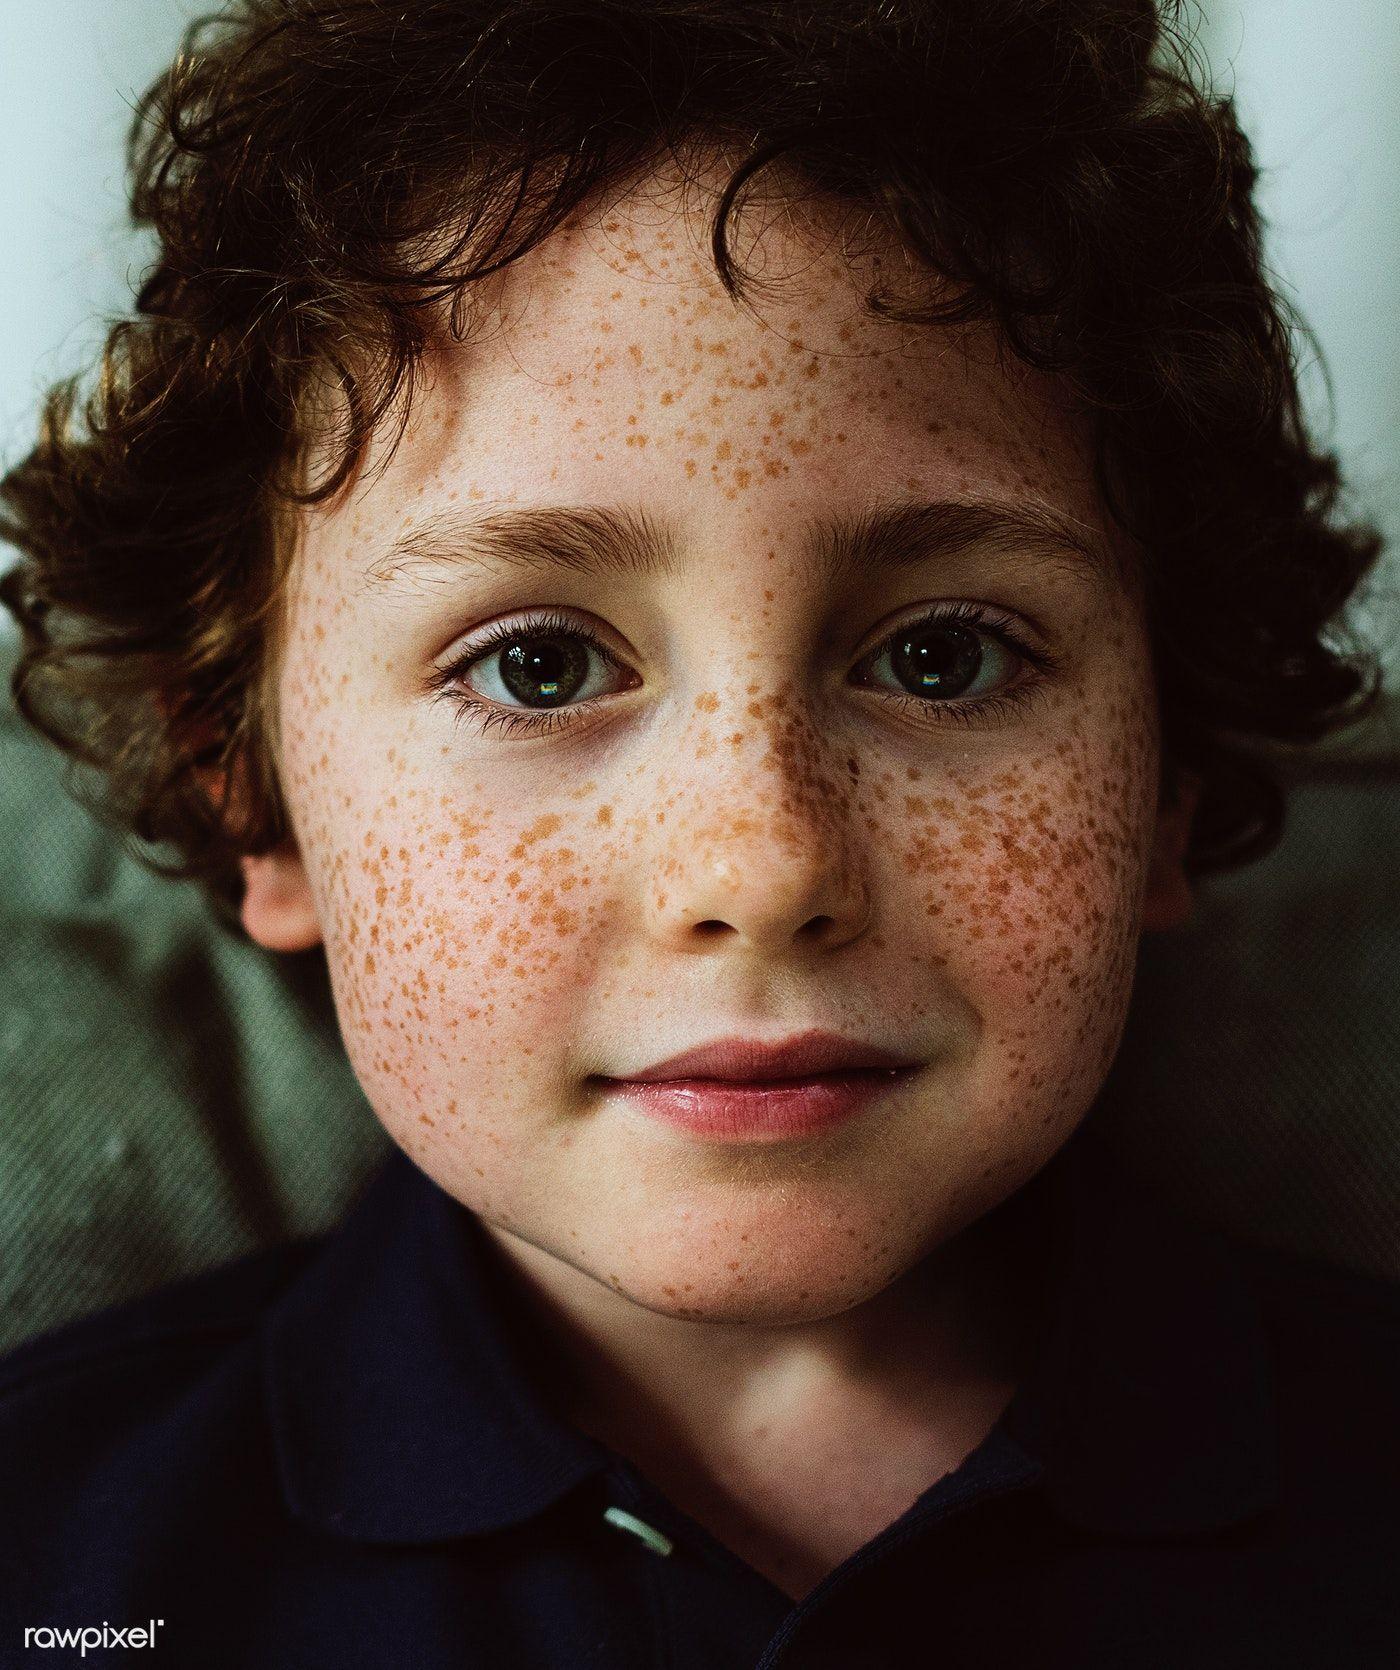 Young Cheerful Caucasian Boy Portrait Premium Image By Rawpixel Com In 2020 Portrait Cute Little Boys Freckles